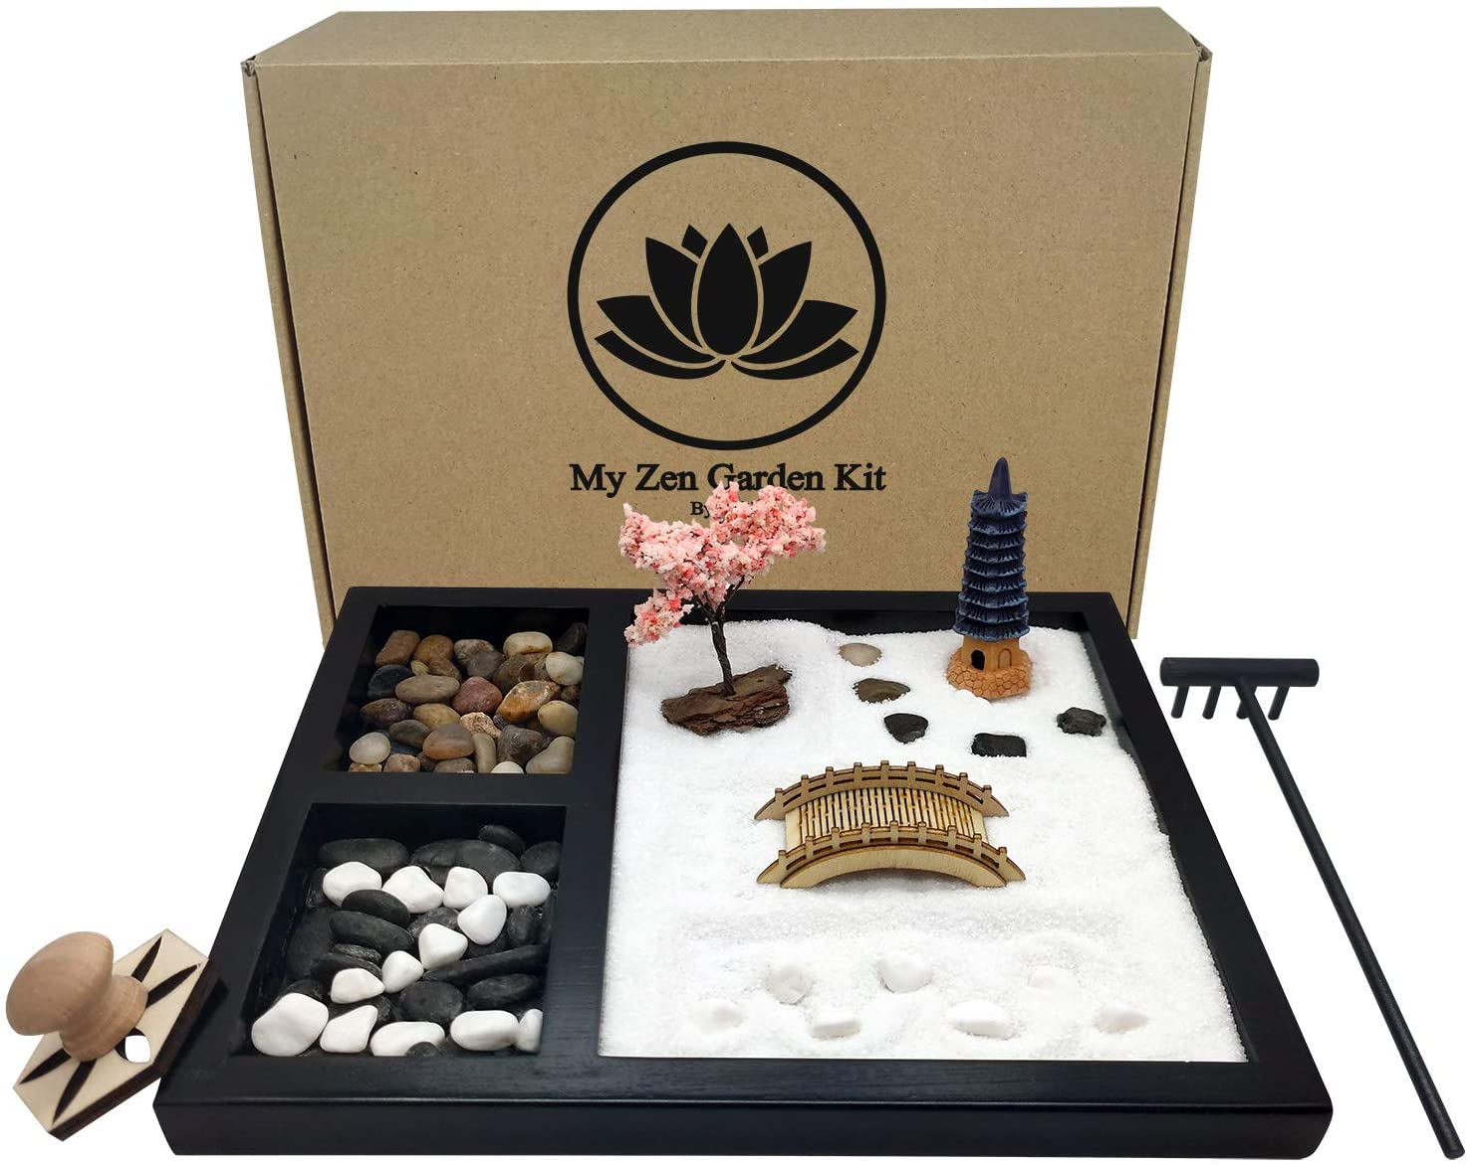 Oritlife Zen Garden for Desk with Three Grid Square Sandbox, Mini Meditation Zen Garden Kit , River Rocks, Bamboo Rake, Wooden Bridge, White Sand, Cherry Blossom Tree, Pagoda